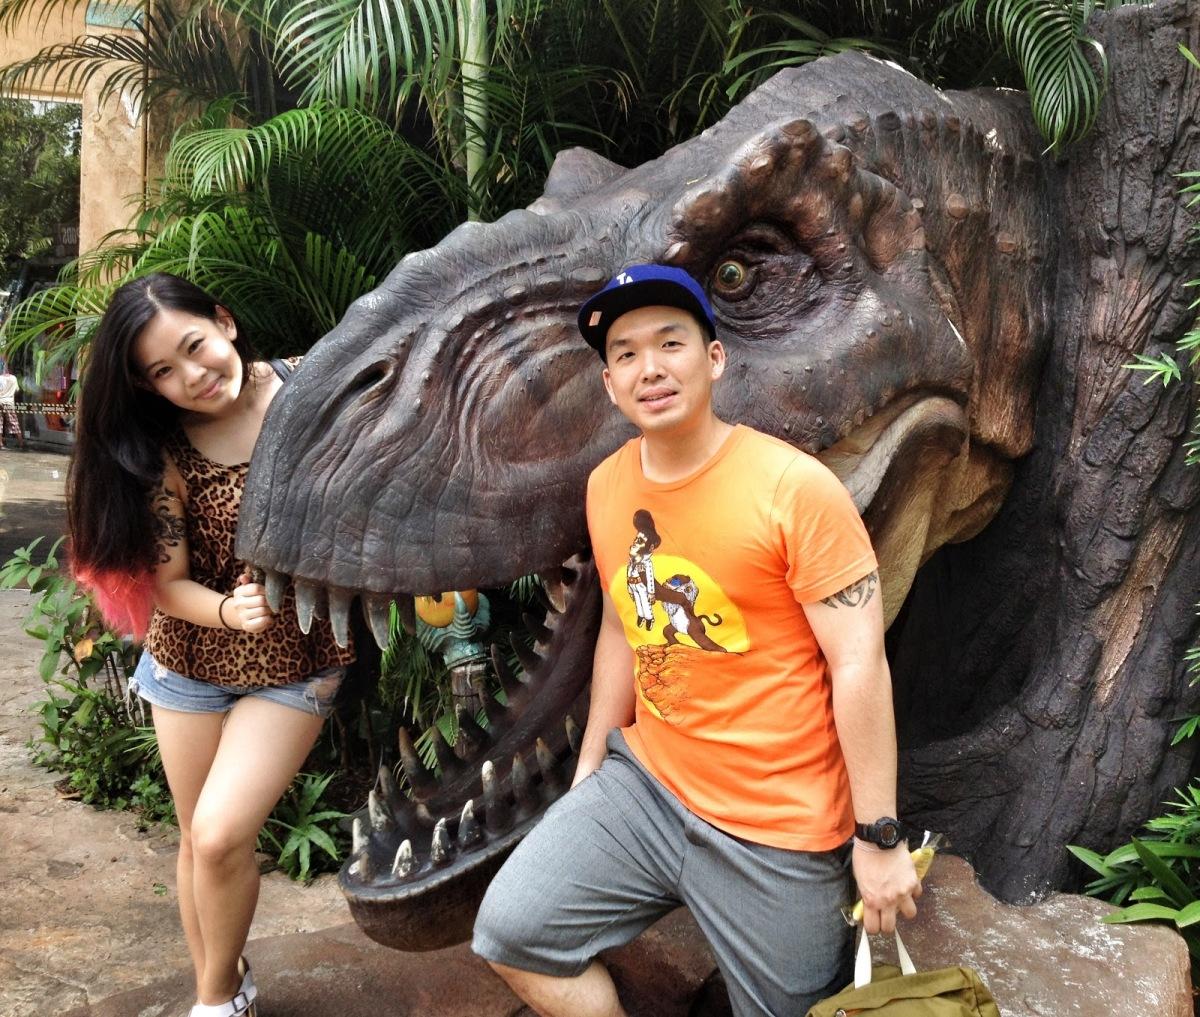 Universal Studios Singapore 2013 - Part 2